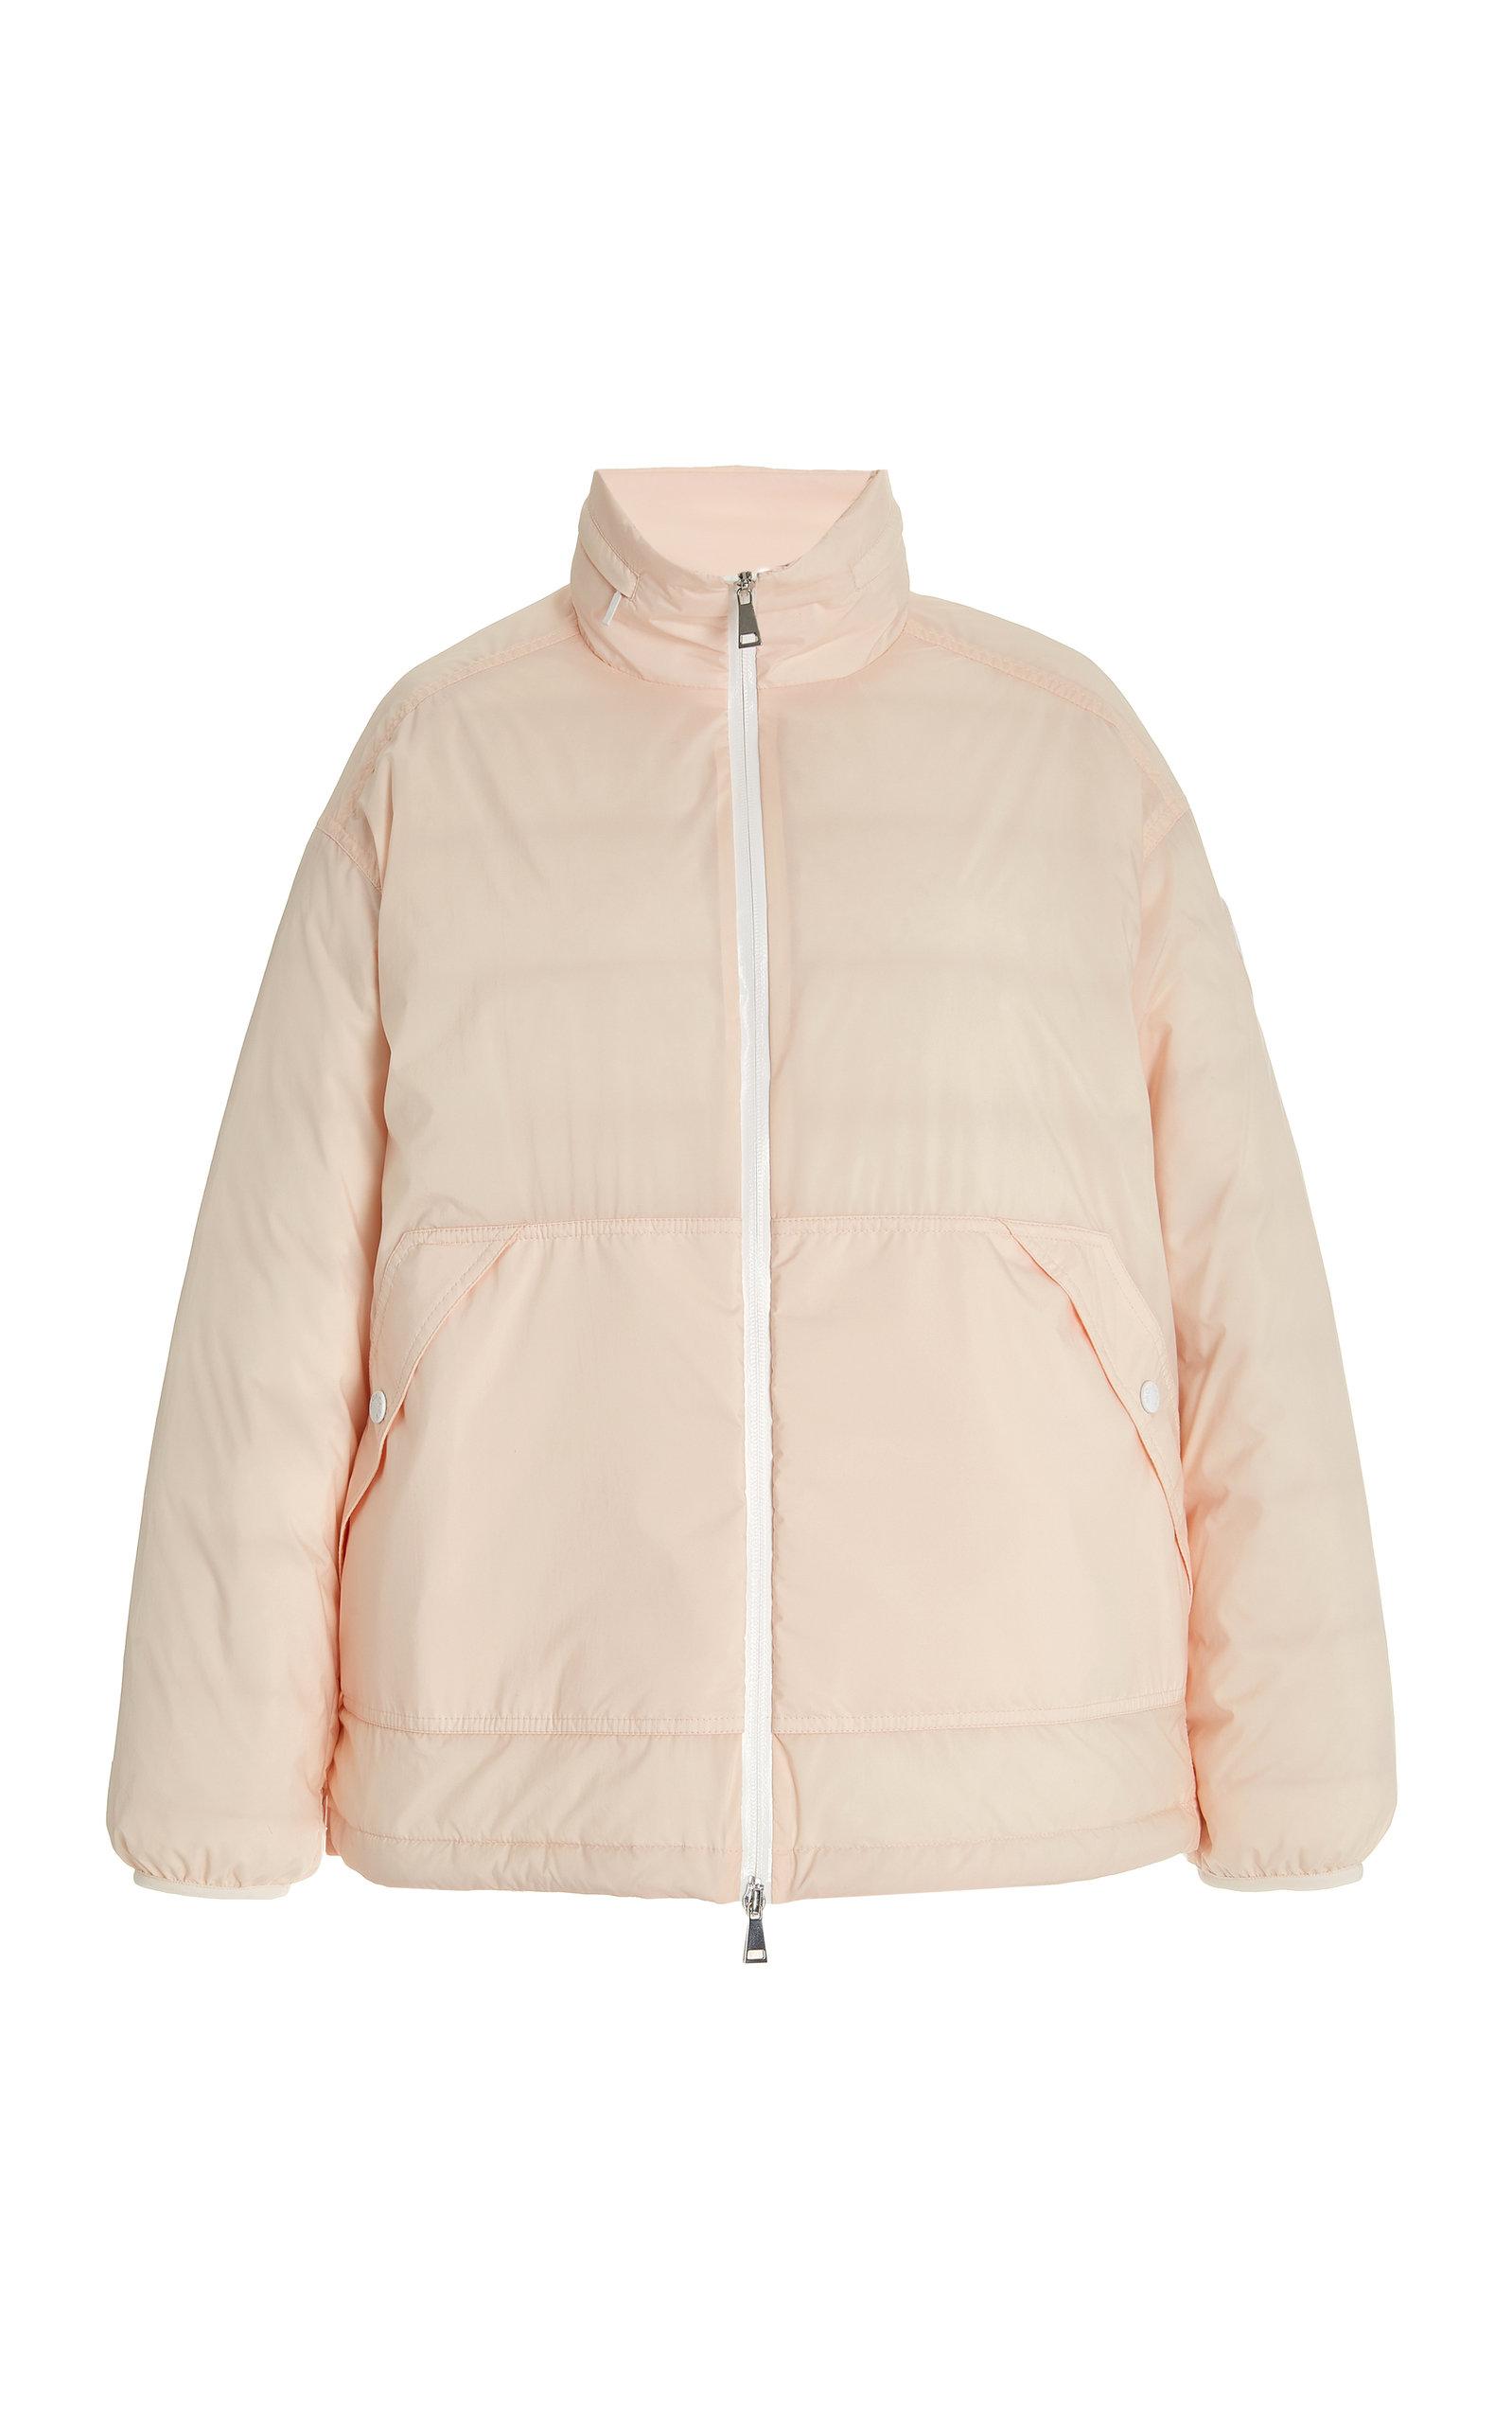 Moncler - Women's Menchib Zip-Hood Lightweight Shell Jacket  - Pink - Moda Operandi